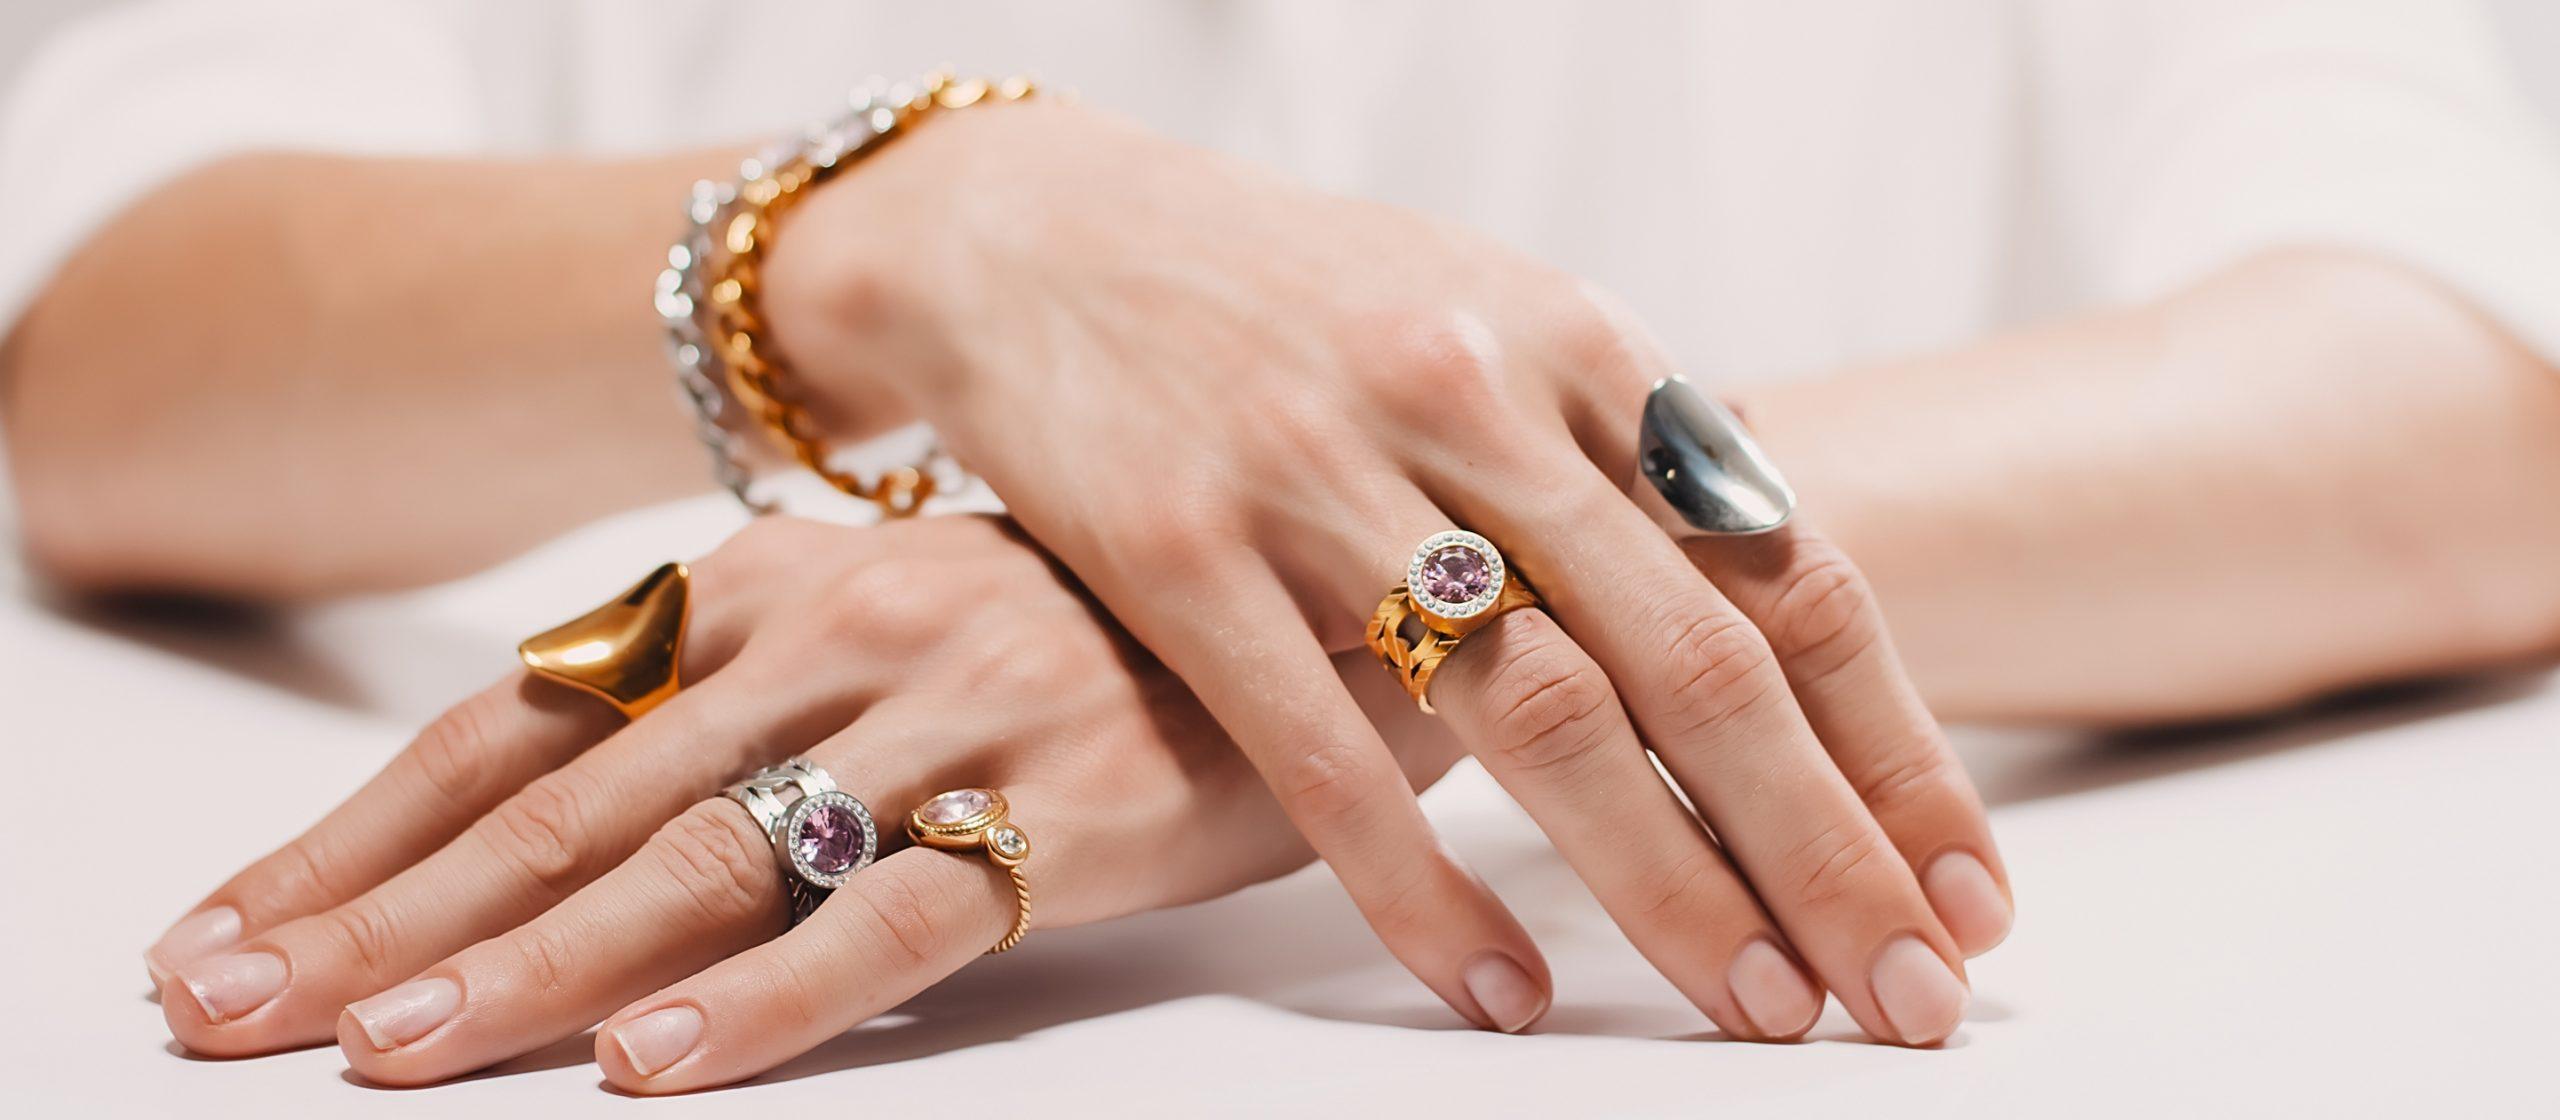 Jewelry photography - φωτογράφιση κοσμημάτων